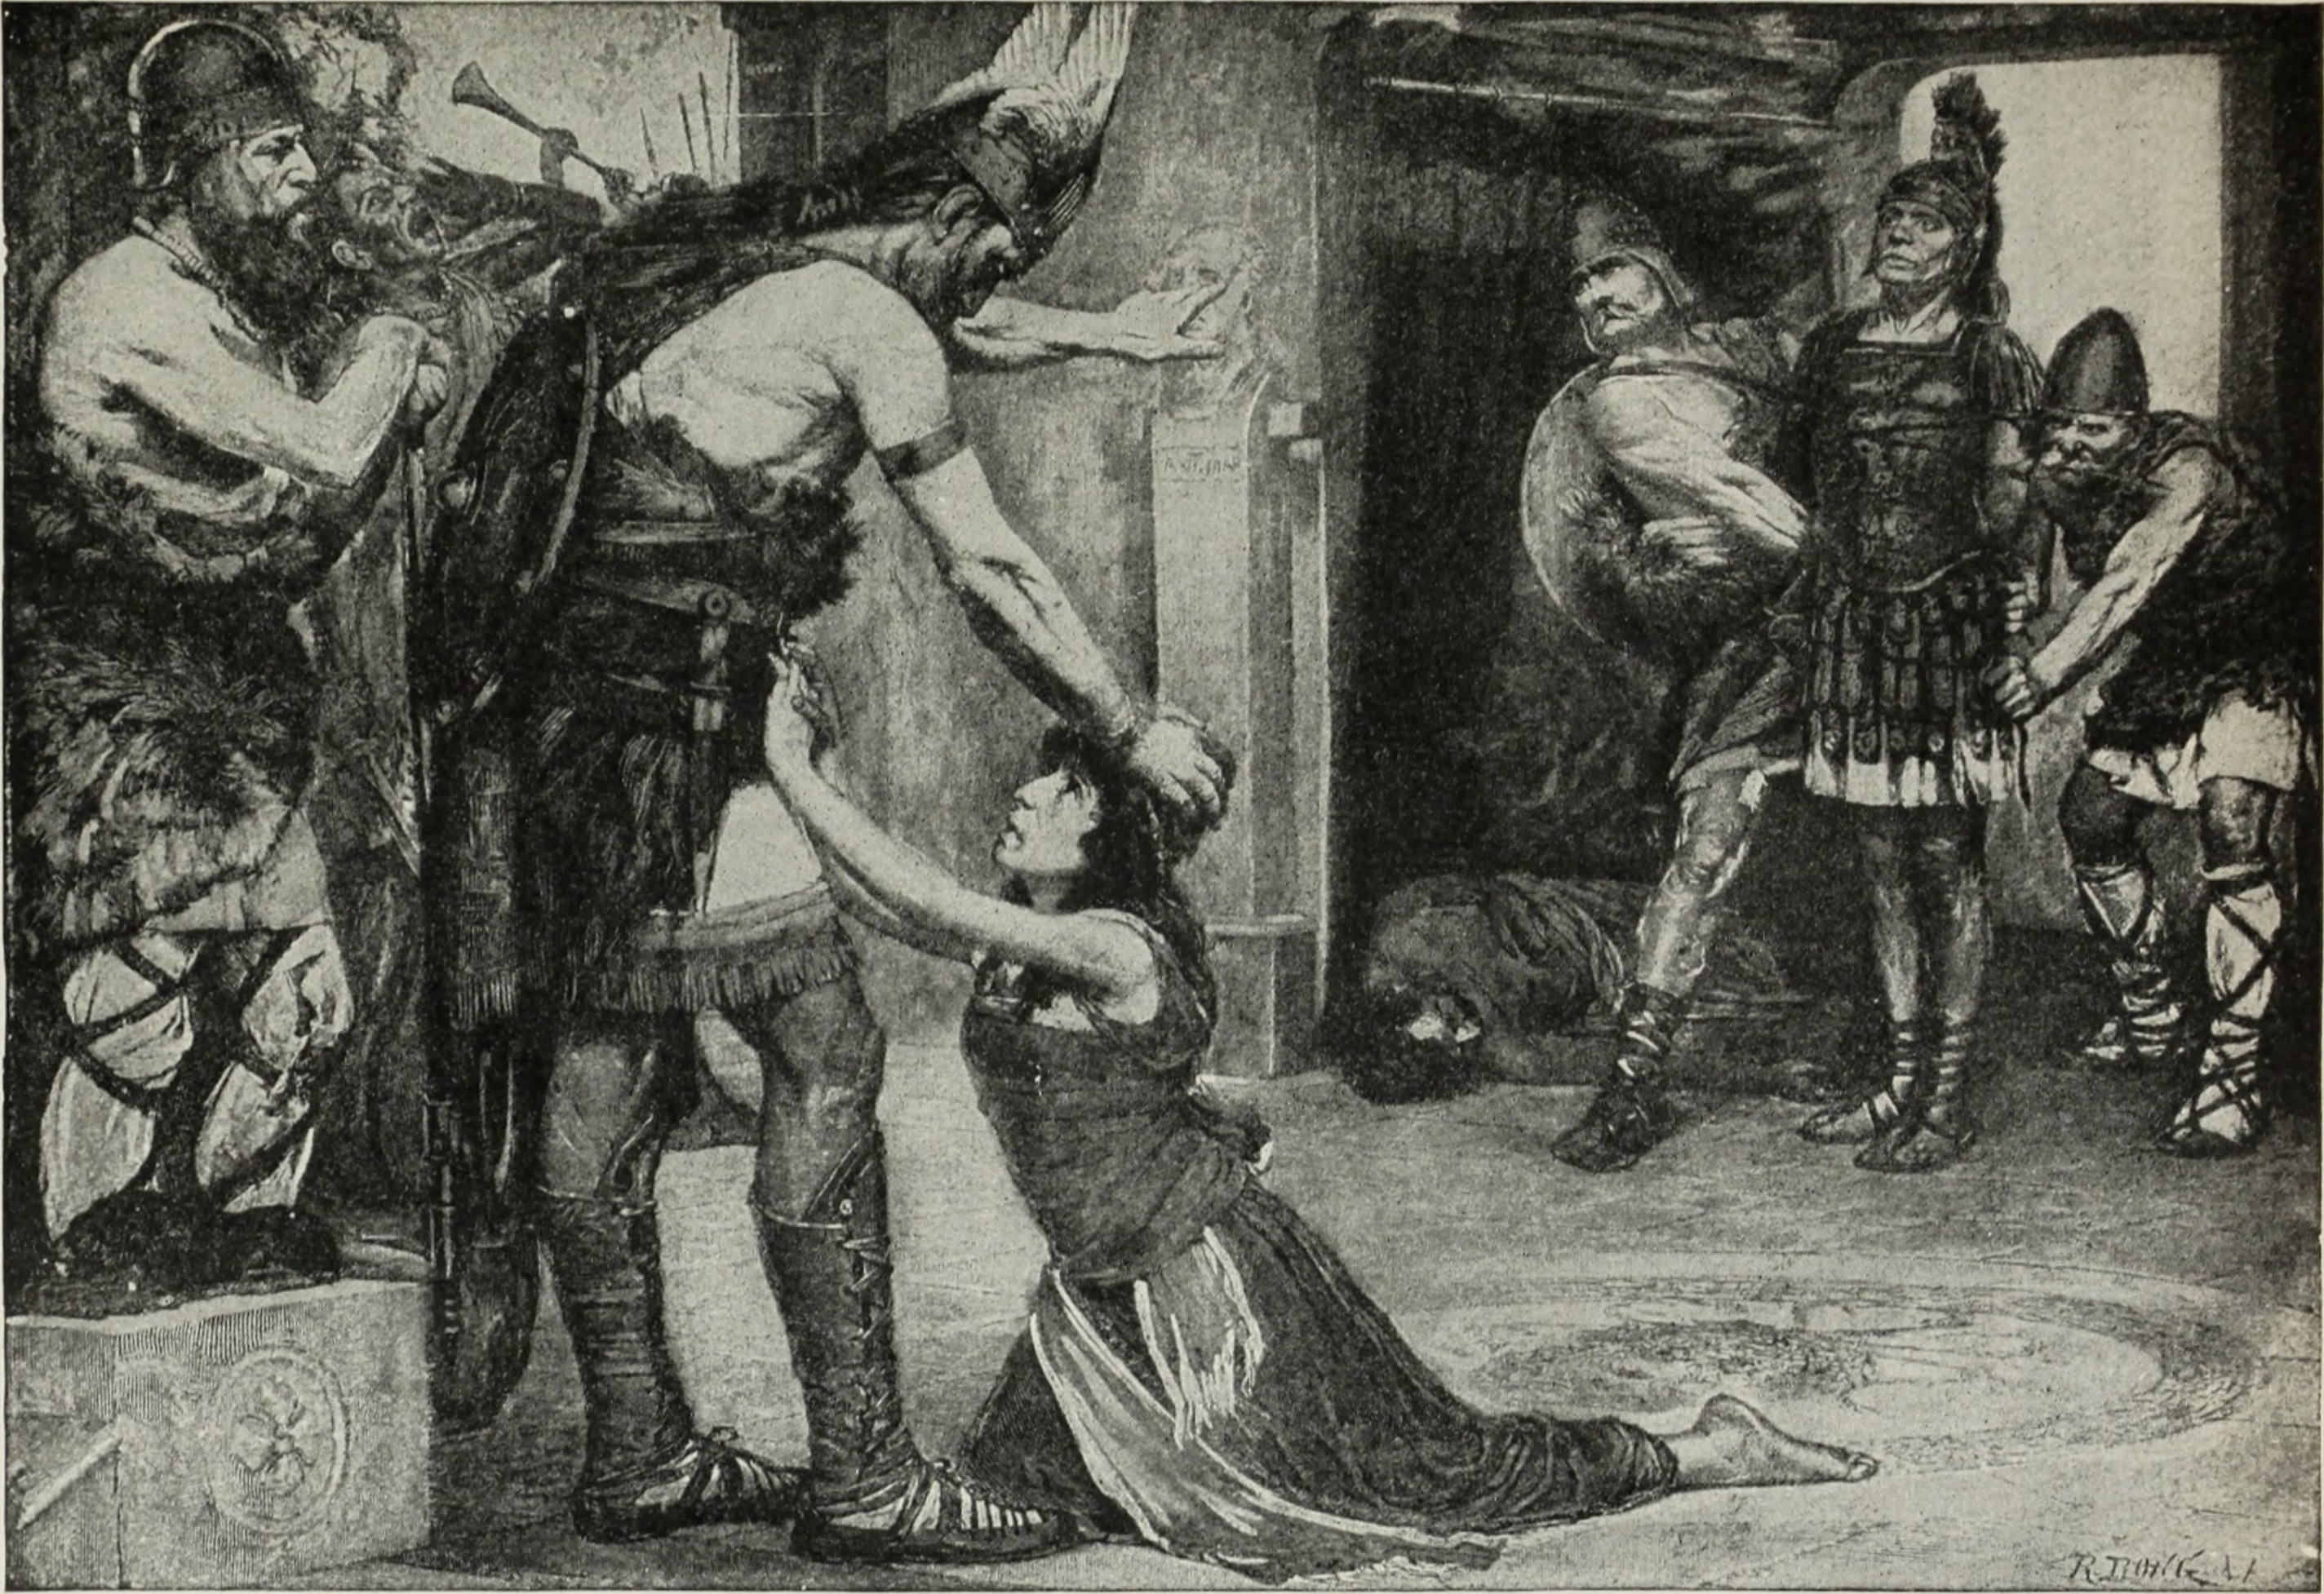 FileThe Bookshelf For Boys And Girls Historic Tales Golden Deeds Part 4